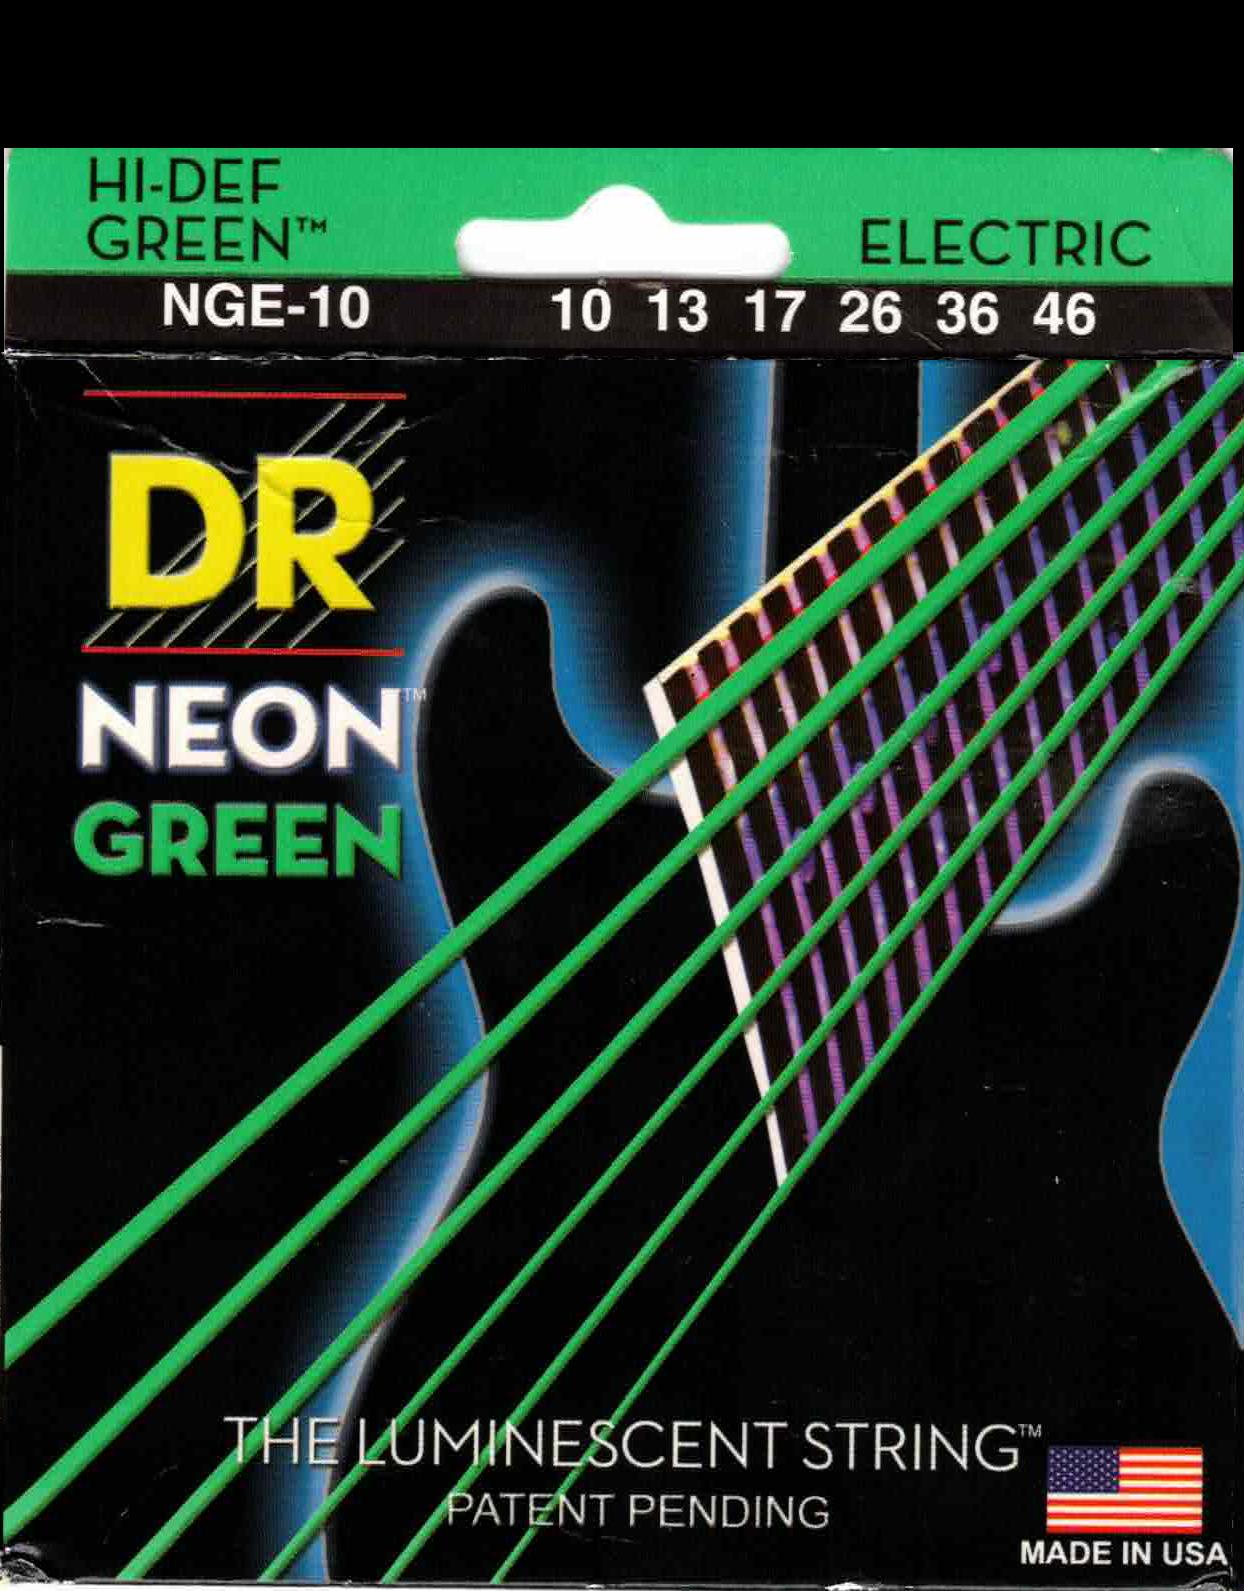 DR Hi-Def NEON GREEN Coated Electric Guitar Strings 10, 13, 17, 26, 36, 46